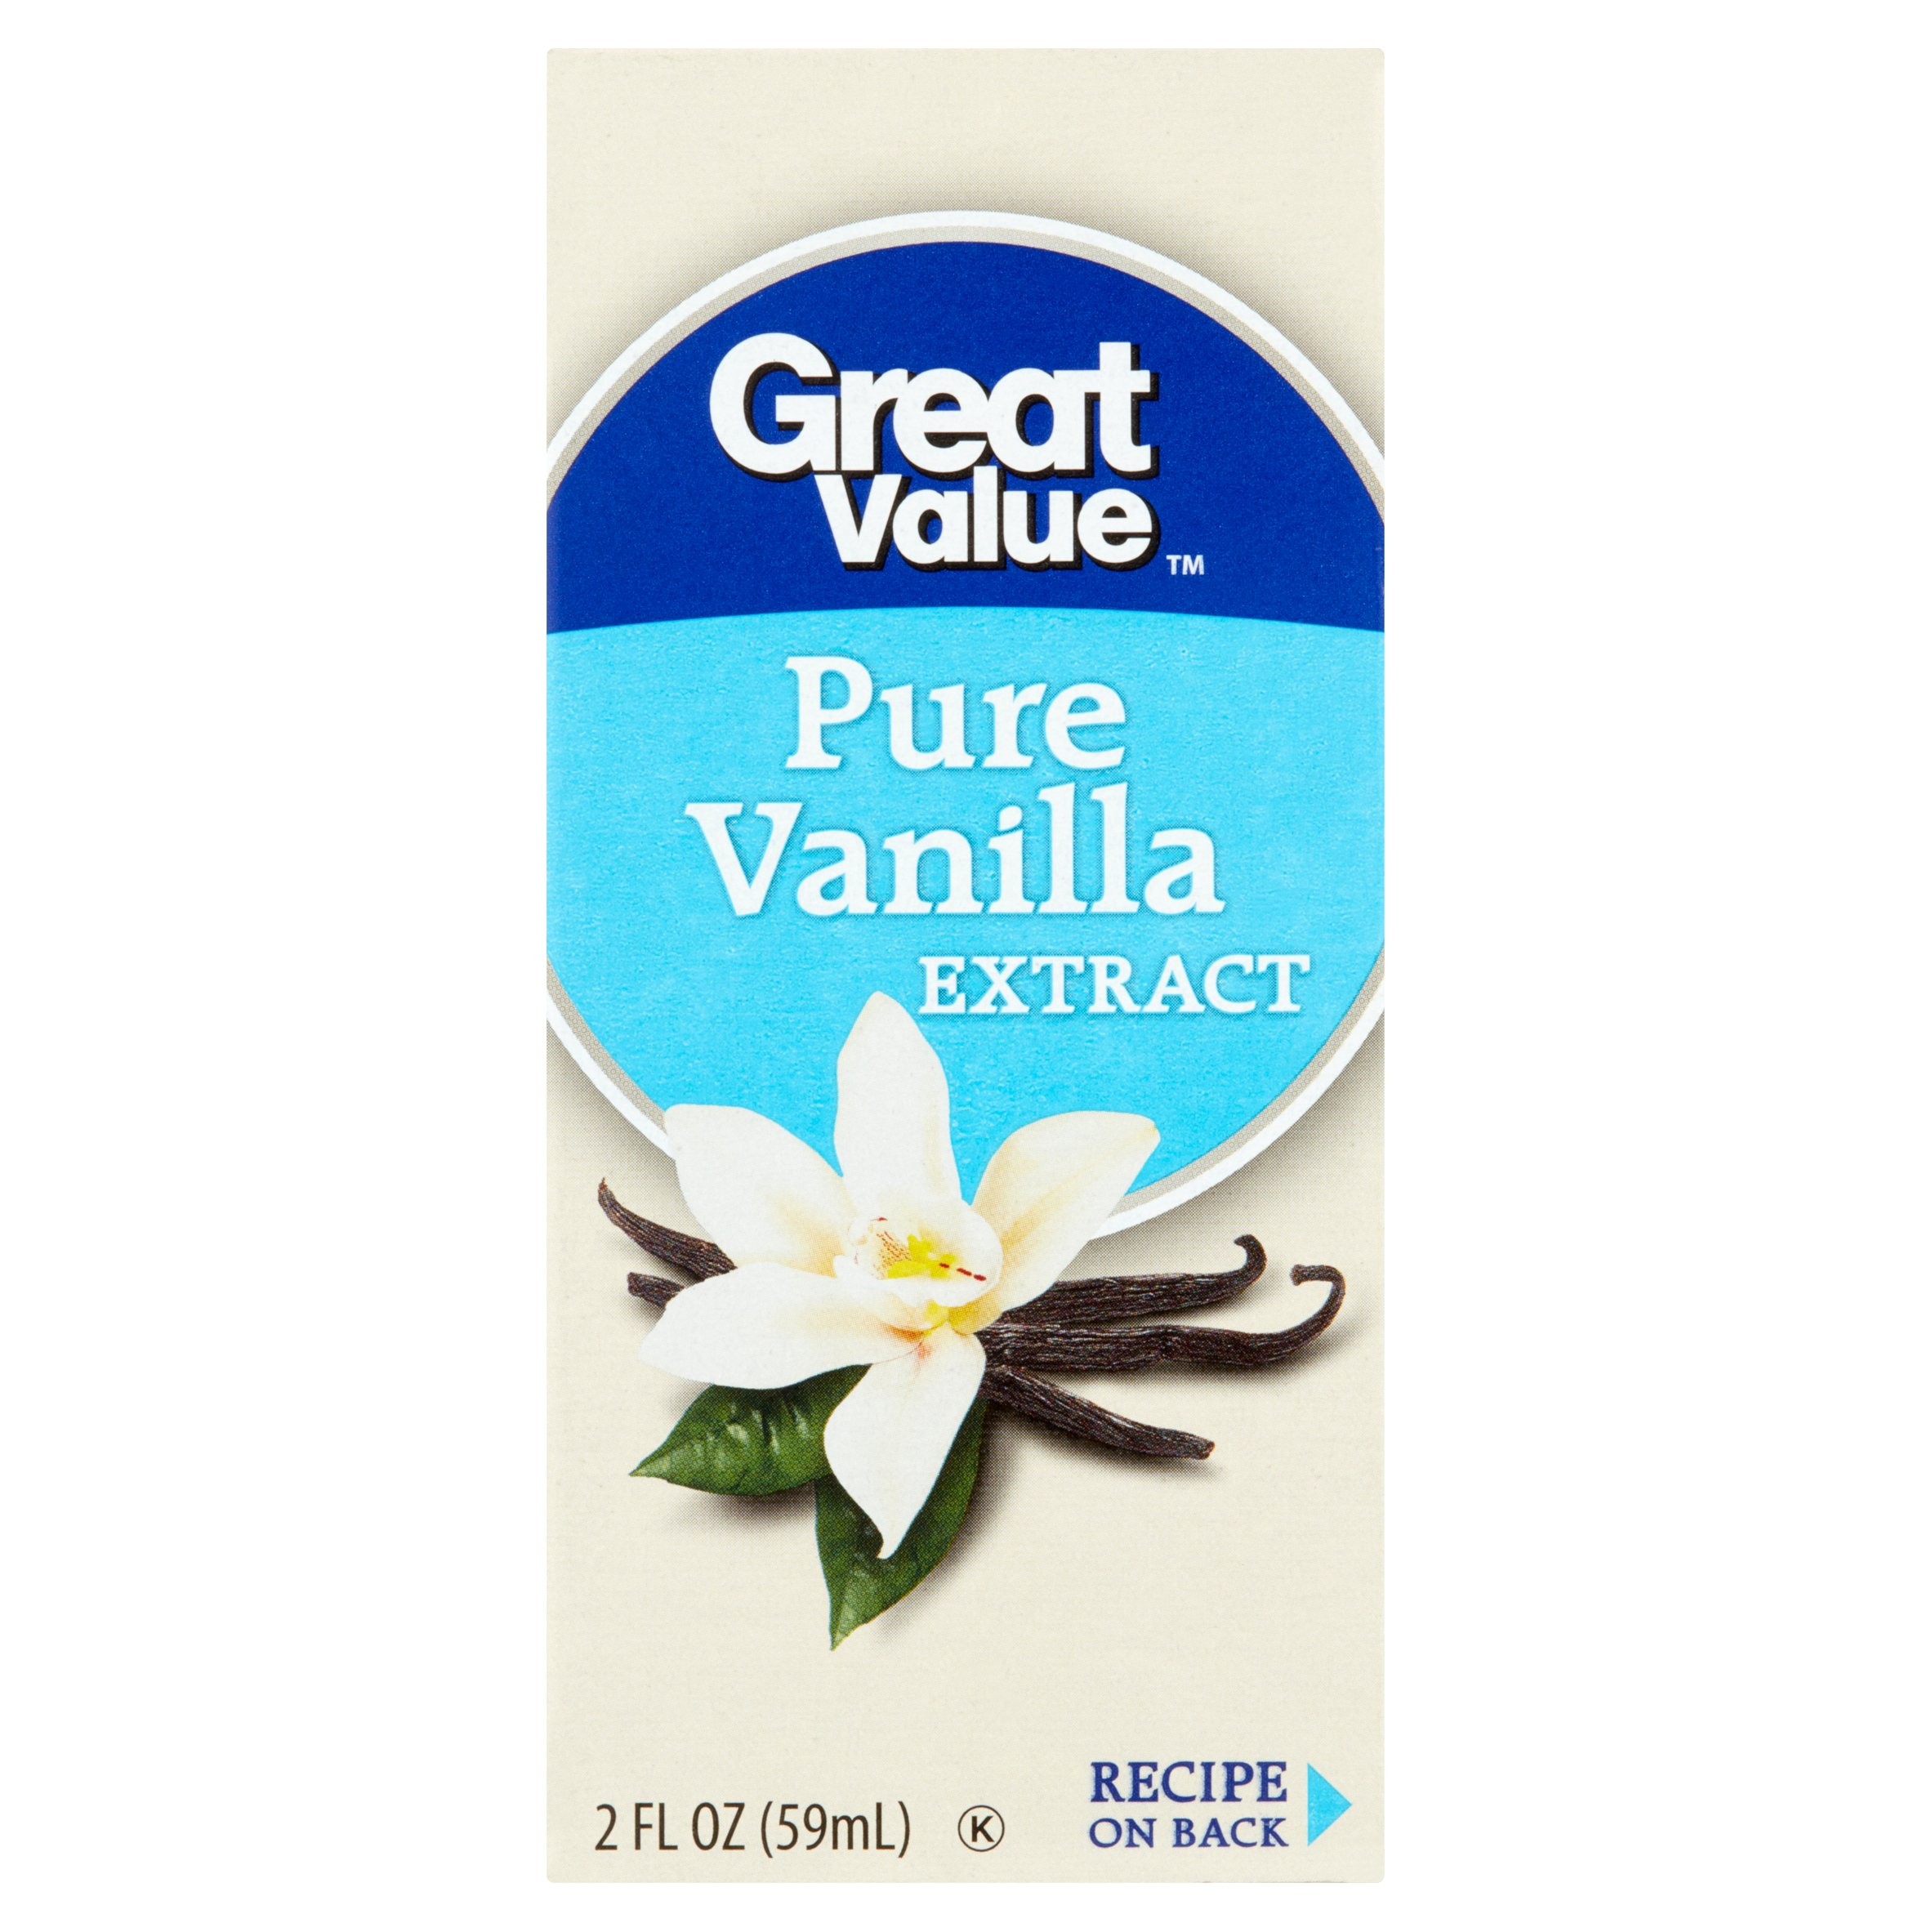 Watkins Great Value Pure Vanilla Extract, 2 fl oz